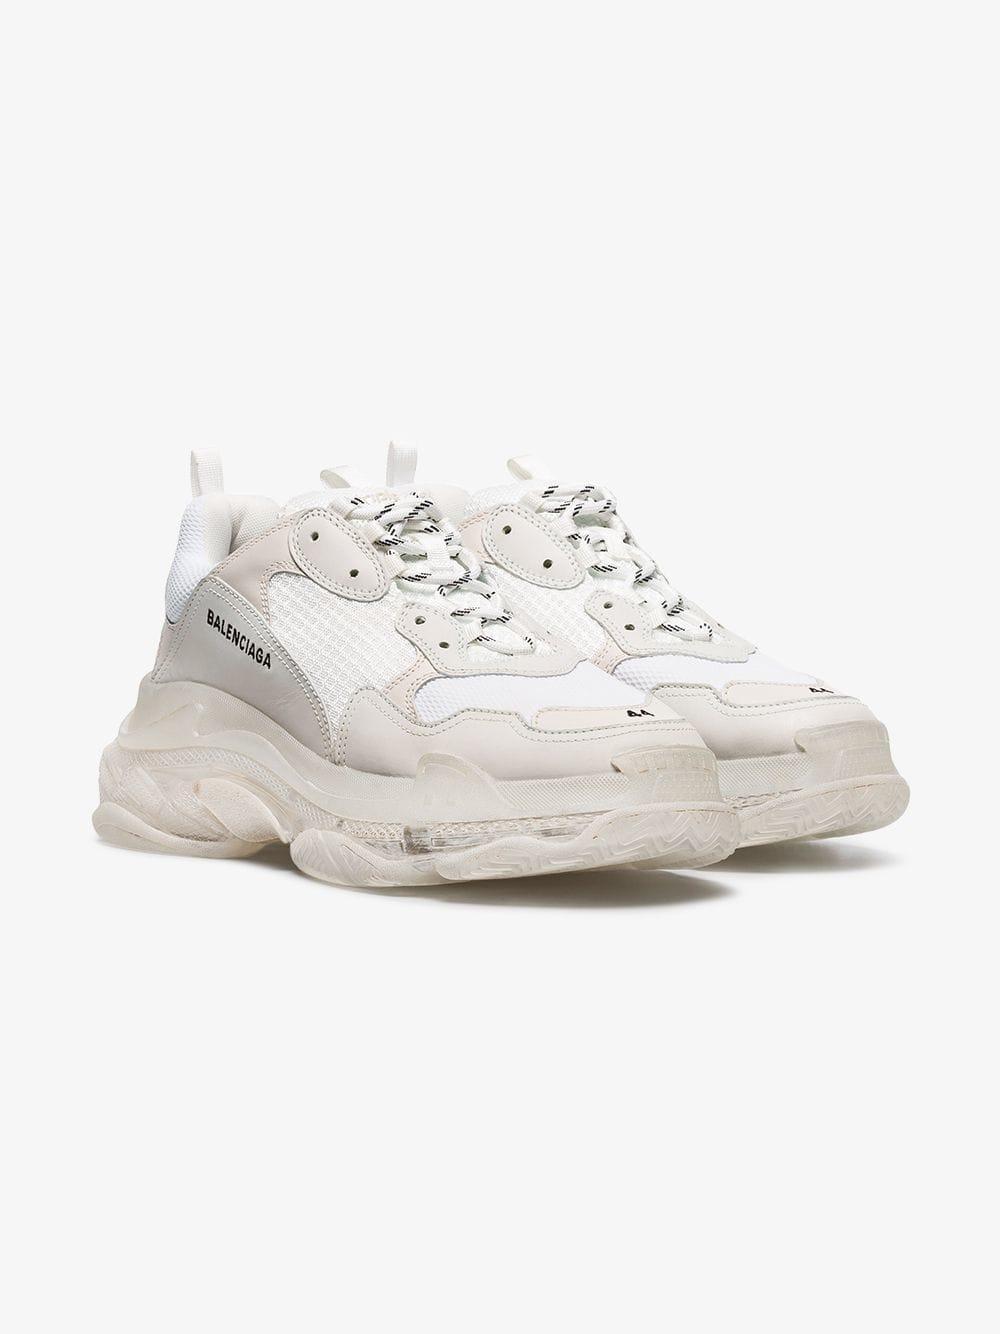 bd65b0425365c Balenciaga - White Triple S Clear Sole Sneakers for Men - Lyst. View  fullscreen